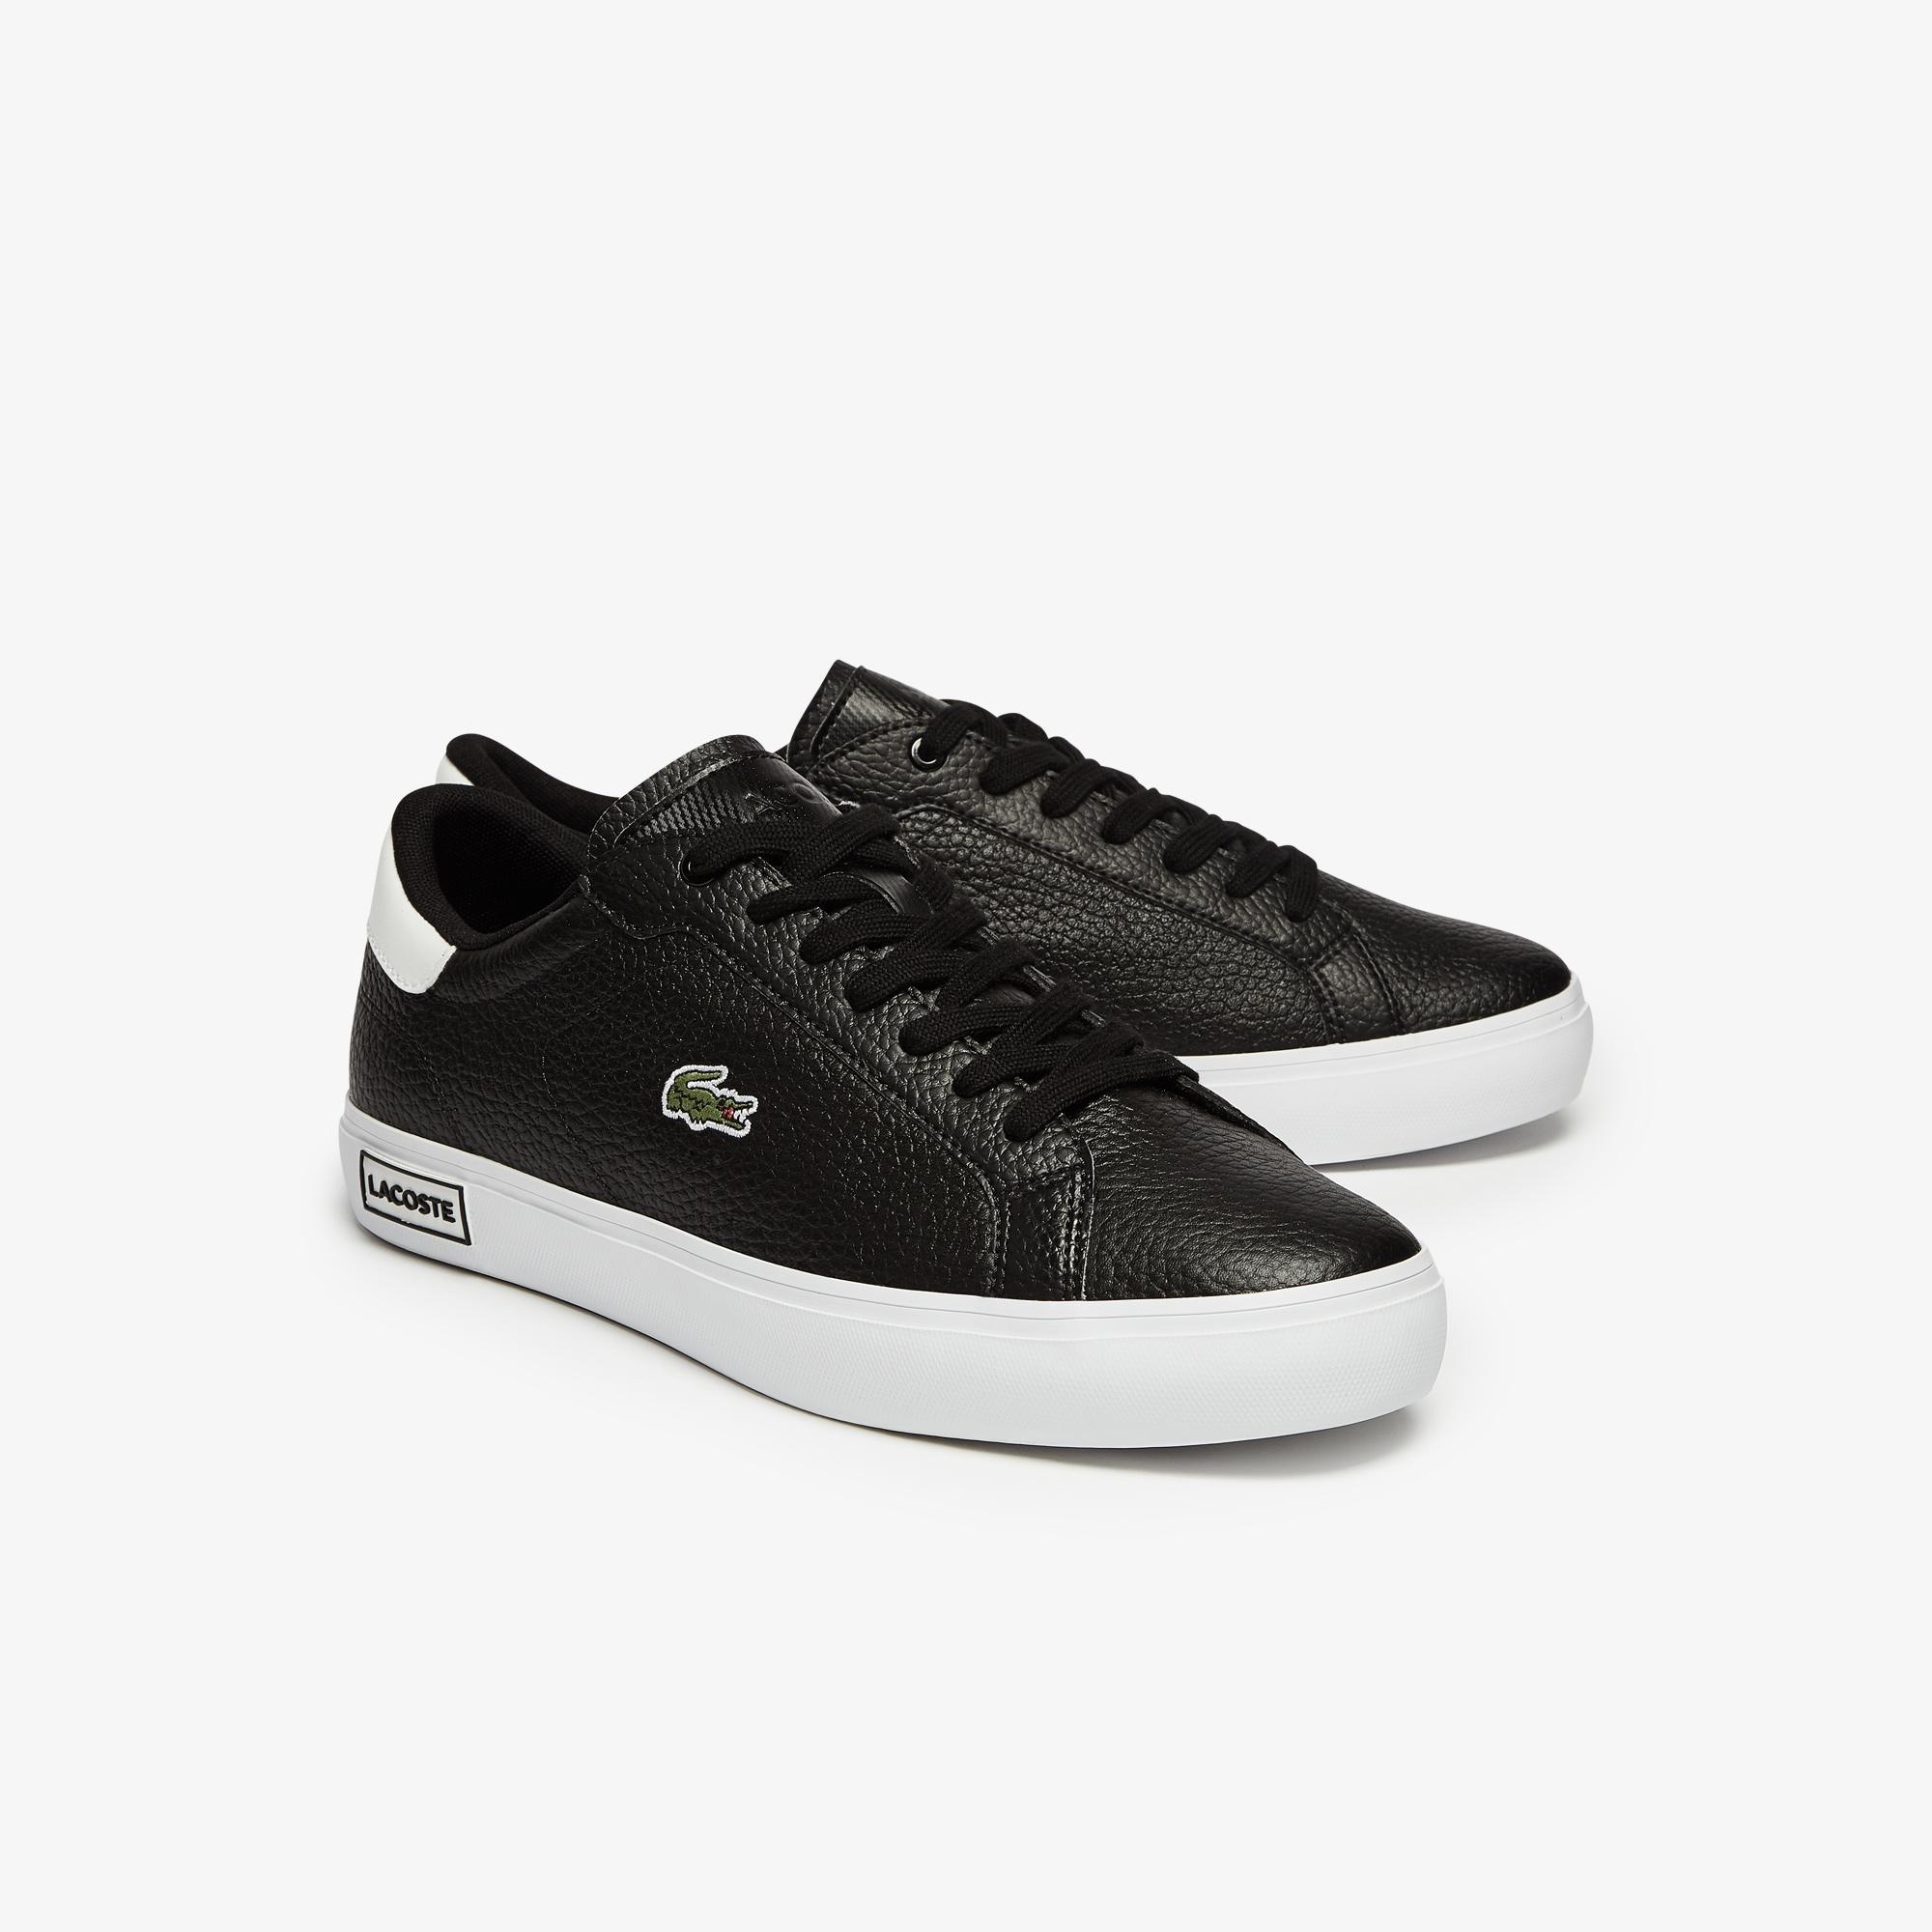 Lacoste Powercourt 0721 2 Sma Erkek Siyah - Beyaz Sneaker